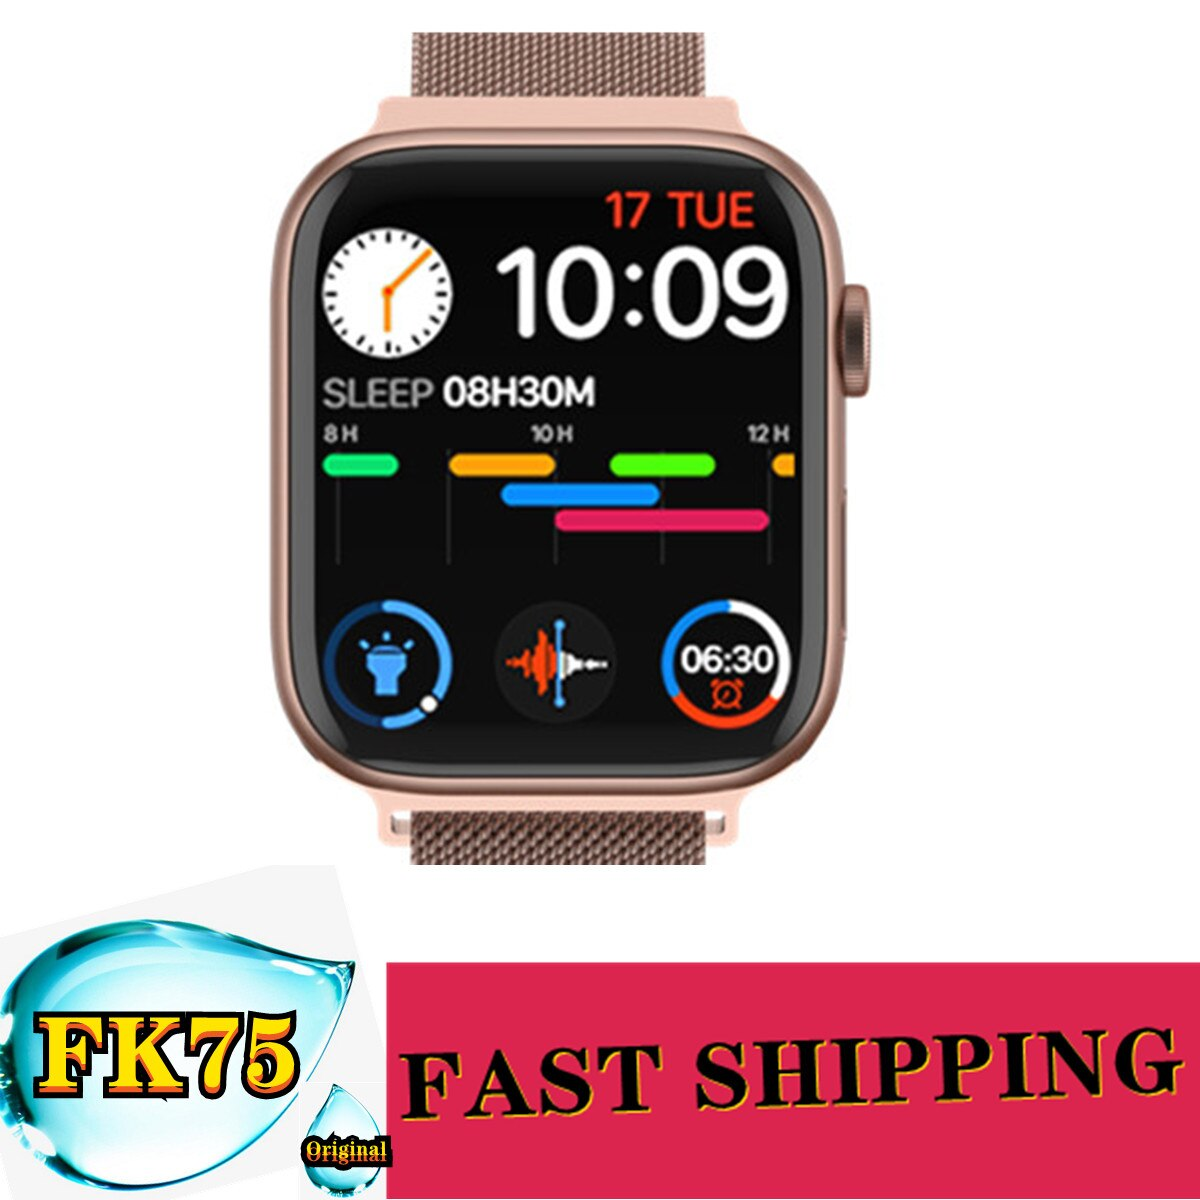 "Get 5pcs New IWO FK75 Smart Watch Series 6 1.75""HD Infinite Screen Bluetooth Call Custom Background Heart Rate Monitor Smartwatch"